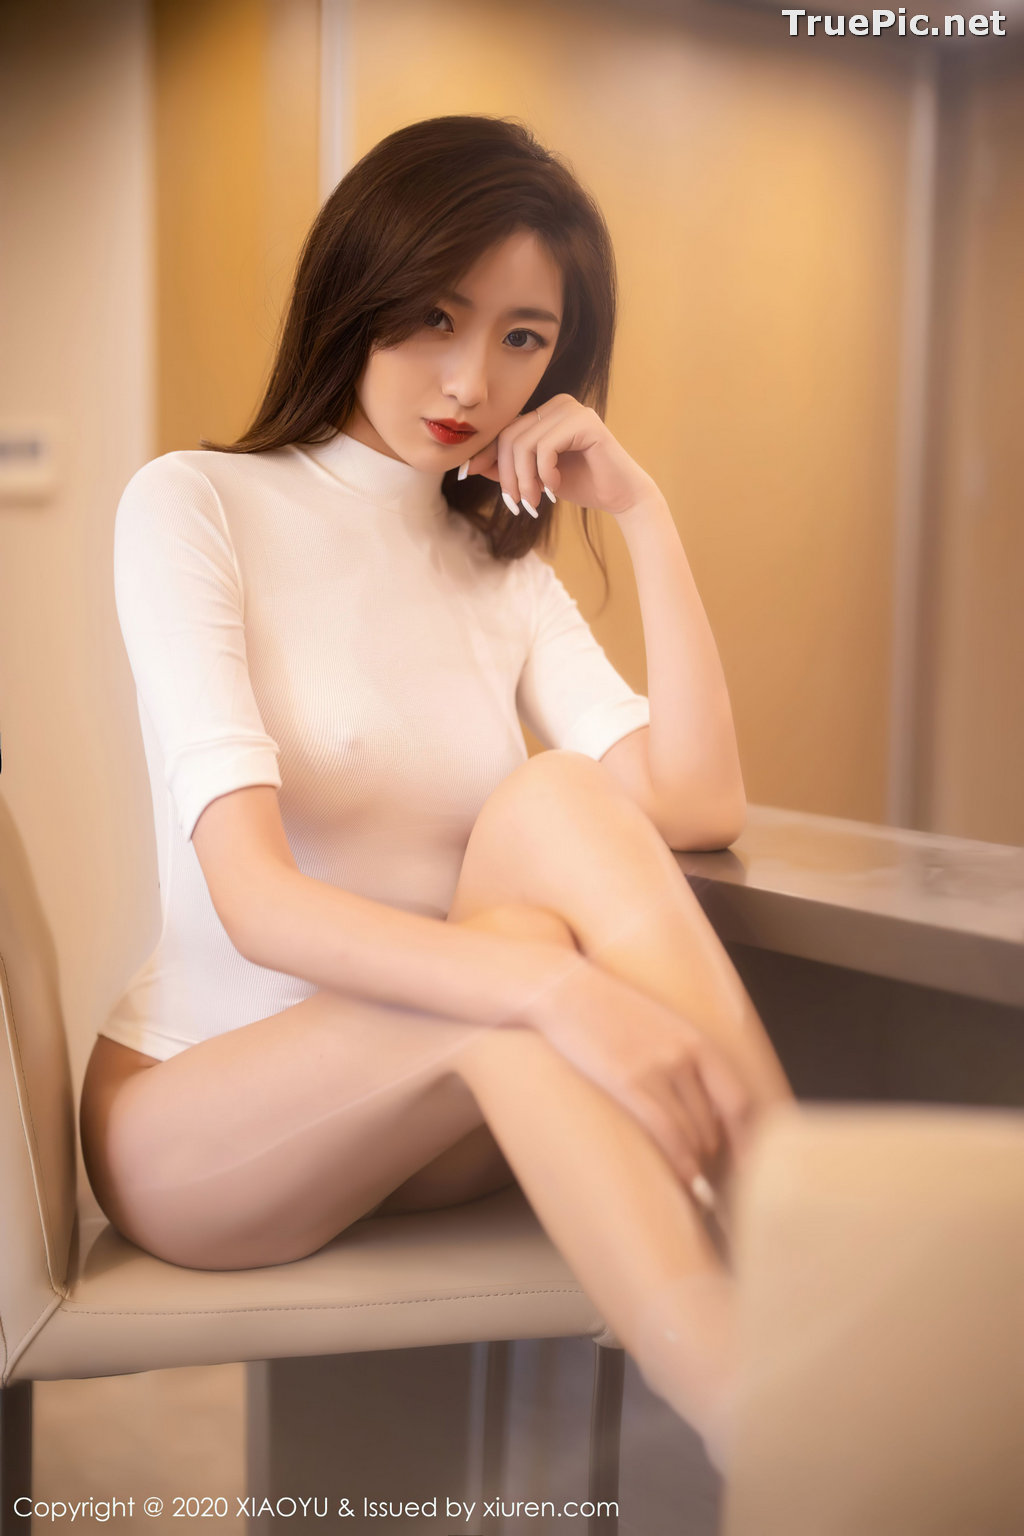 Image XiaoYu Vol.389 - Chinese Model - 安琪 Yee - Beautiful In White - TruePic.net - Picture-7